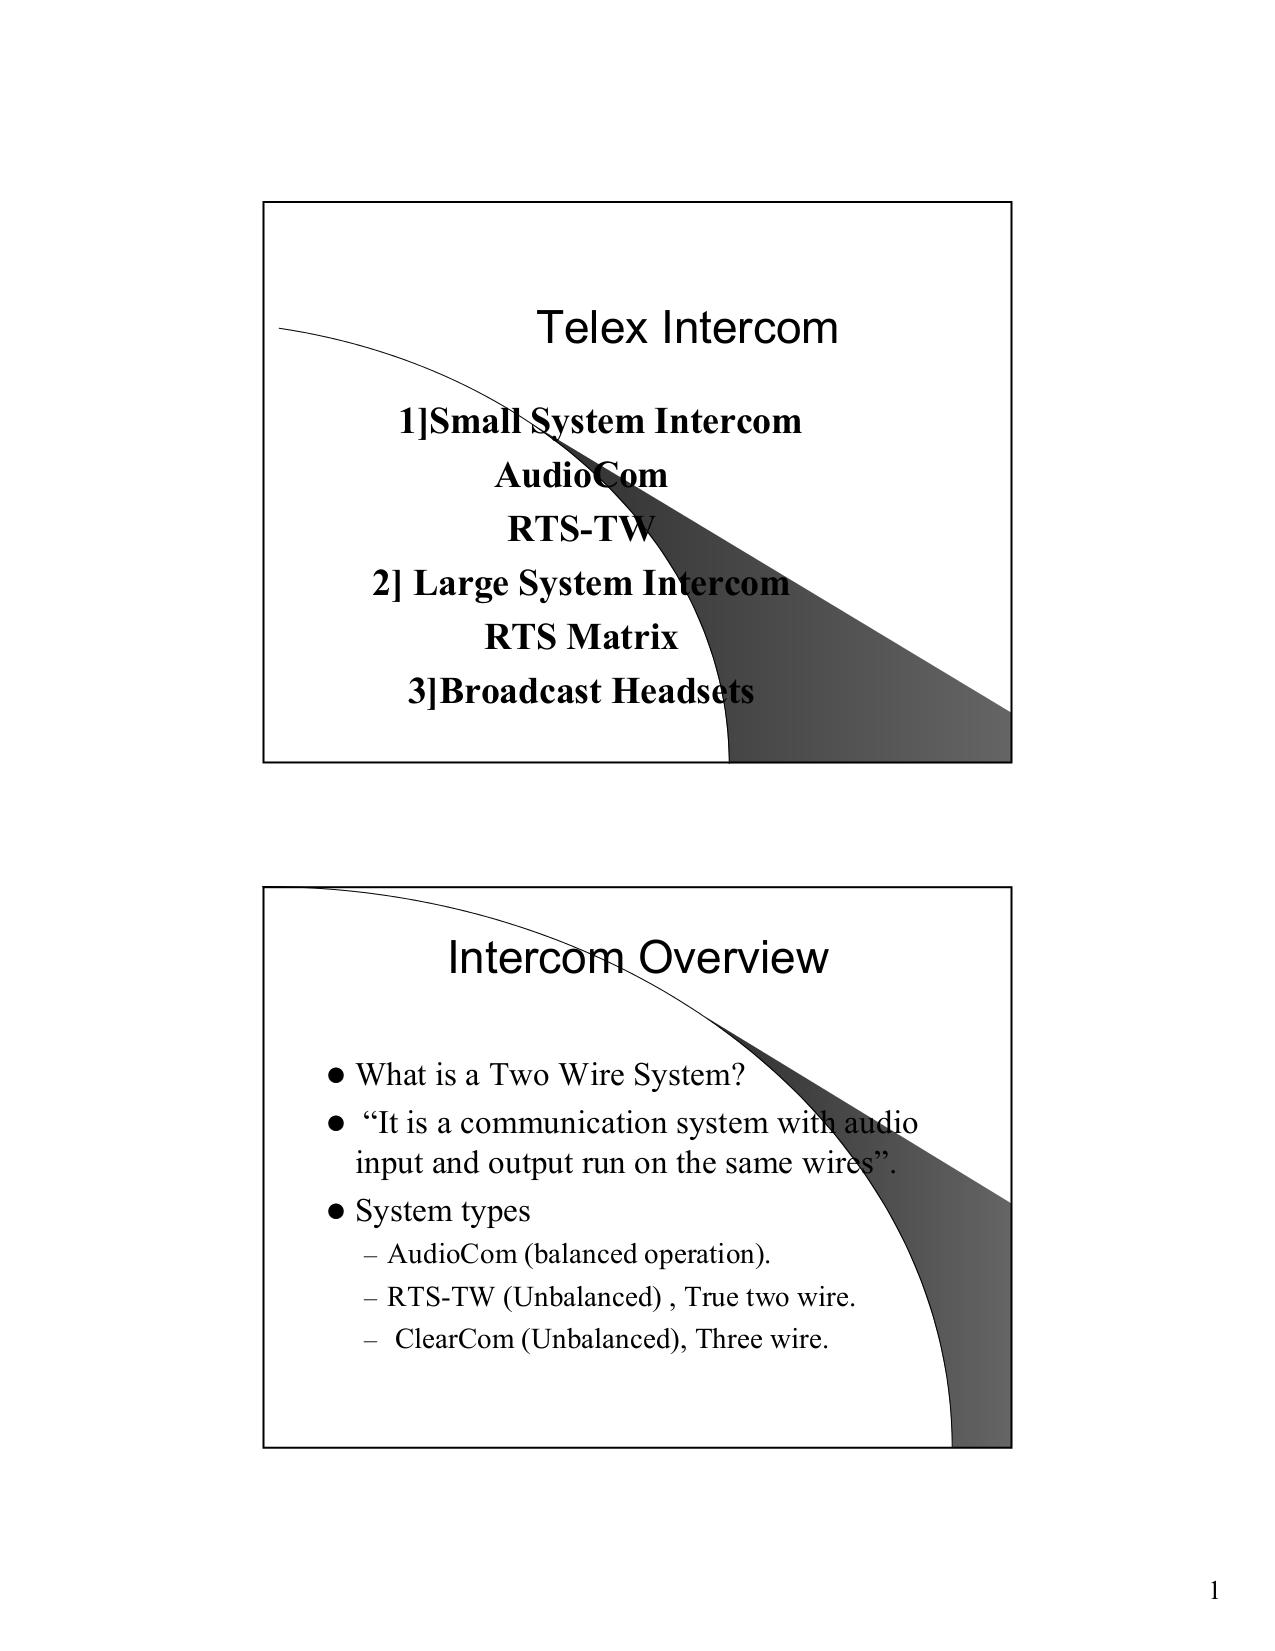 Telex Intercom Wiring Diagram Schematics For 3 Prong Plug Speakon Configurations Pdf